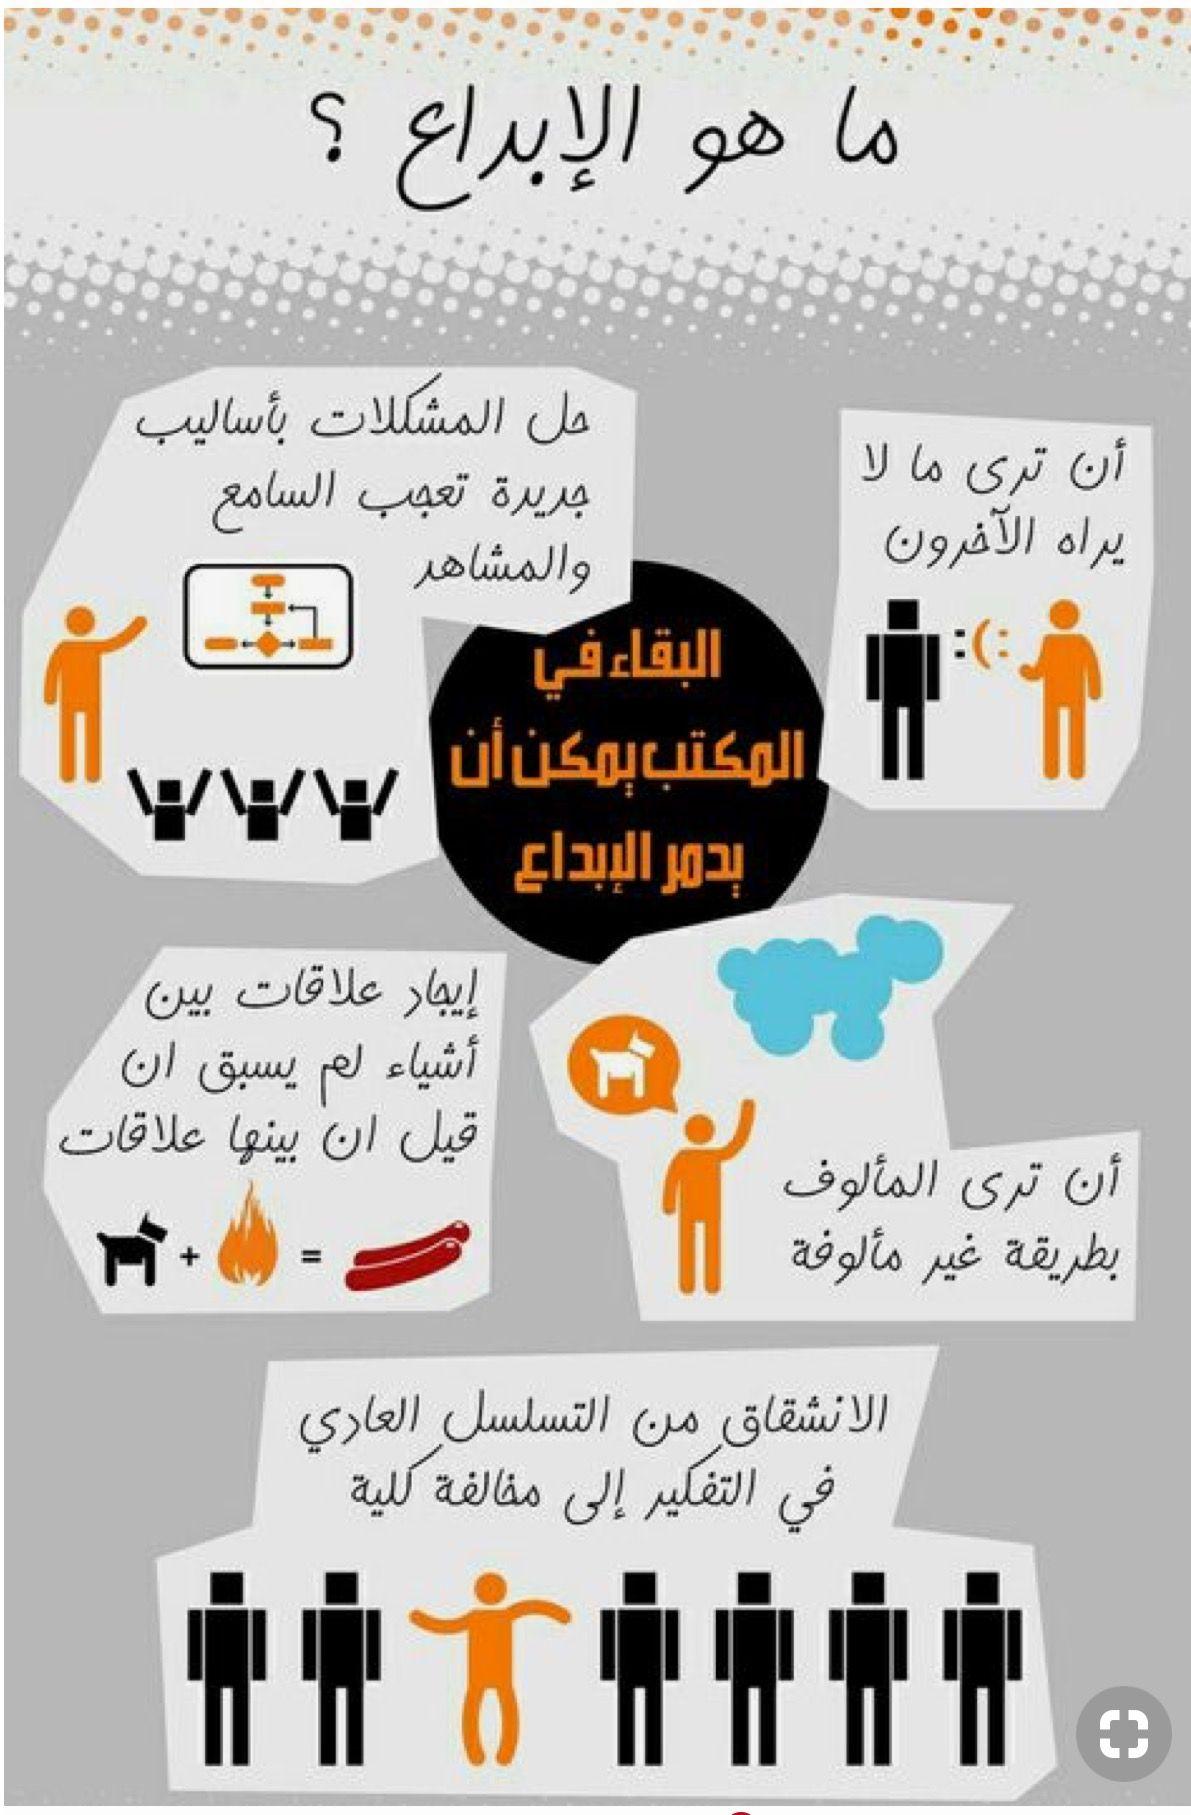 Pin By Shaimaa Zaghlool On تطوير الذات Islamic Kids Activities Social Emotional Learning Life Planner Organization